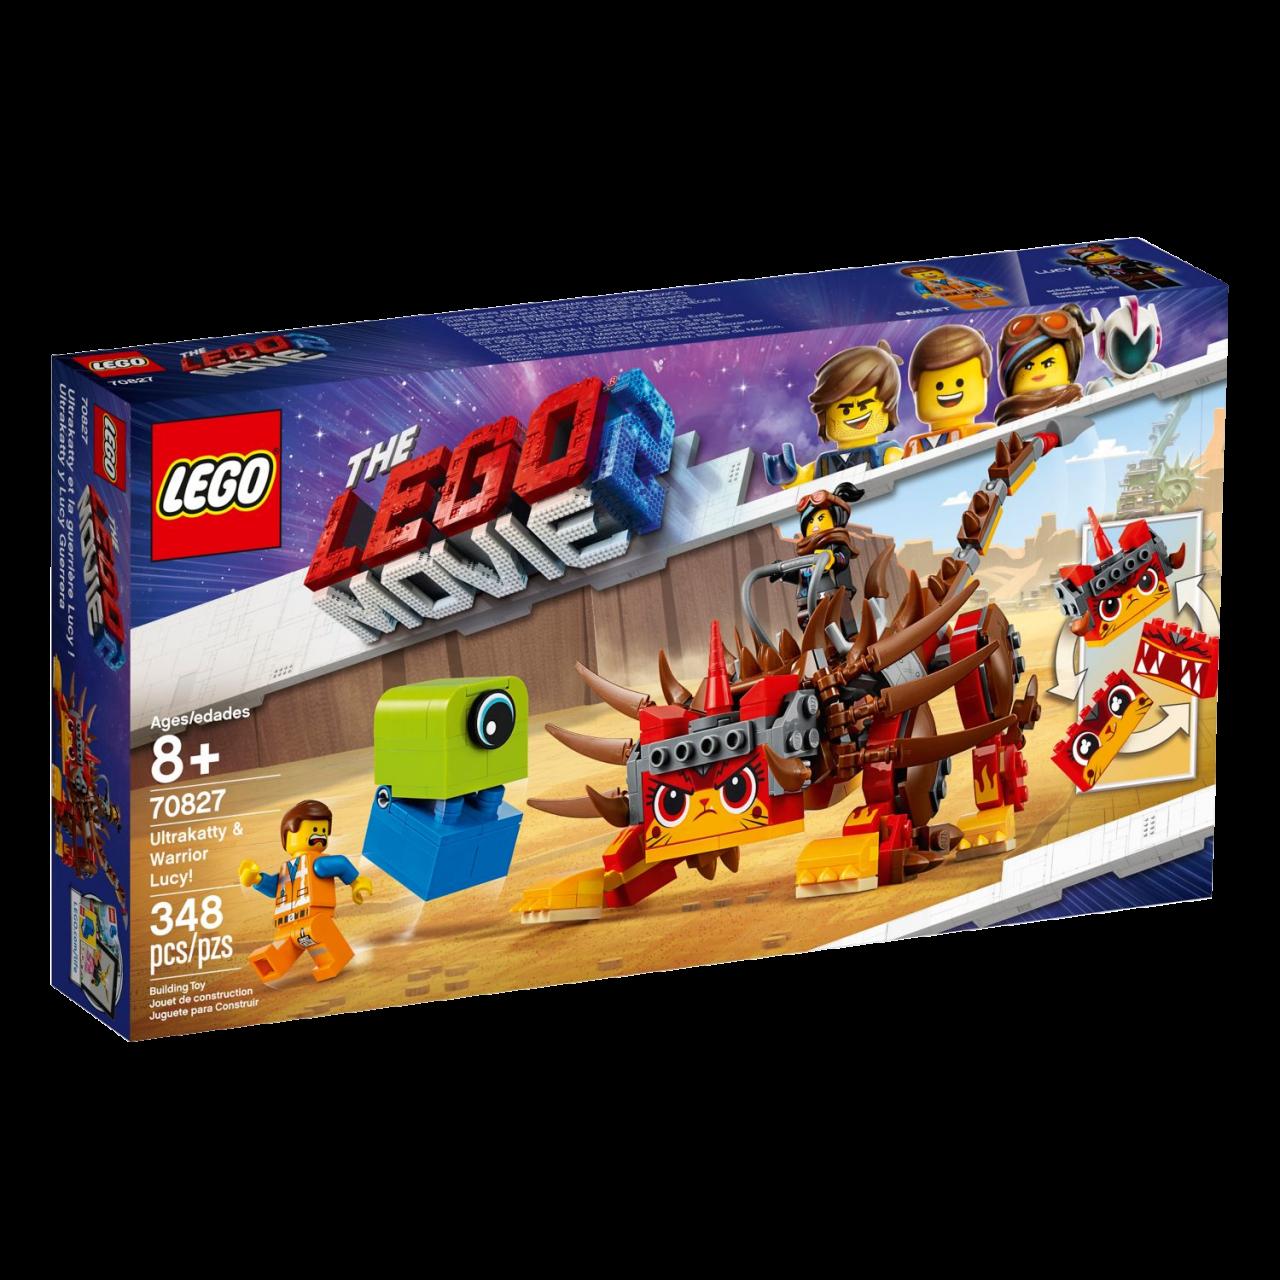 THE LEGO MOVIE 2 70827 Ultrakatty & Krieger-Lucy!